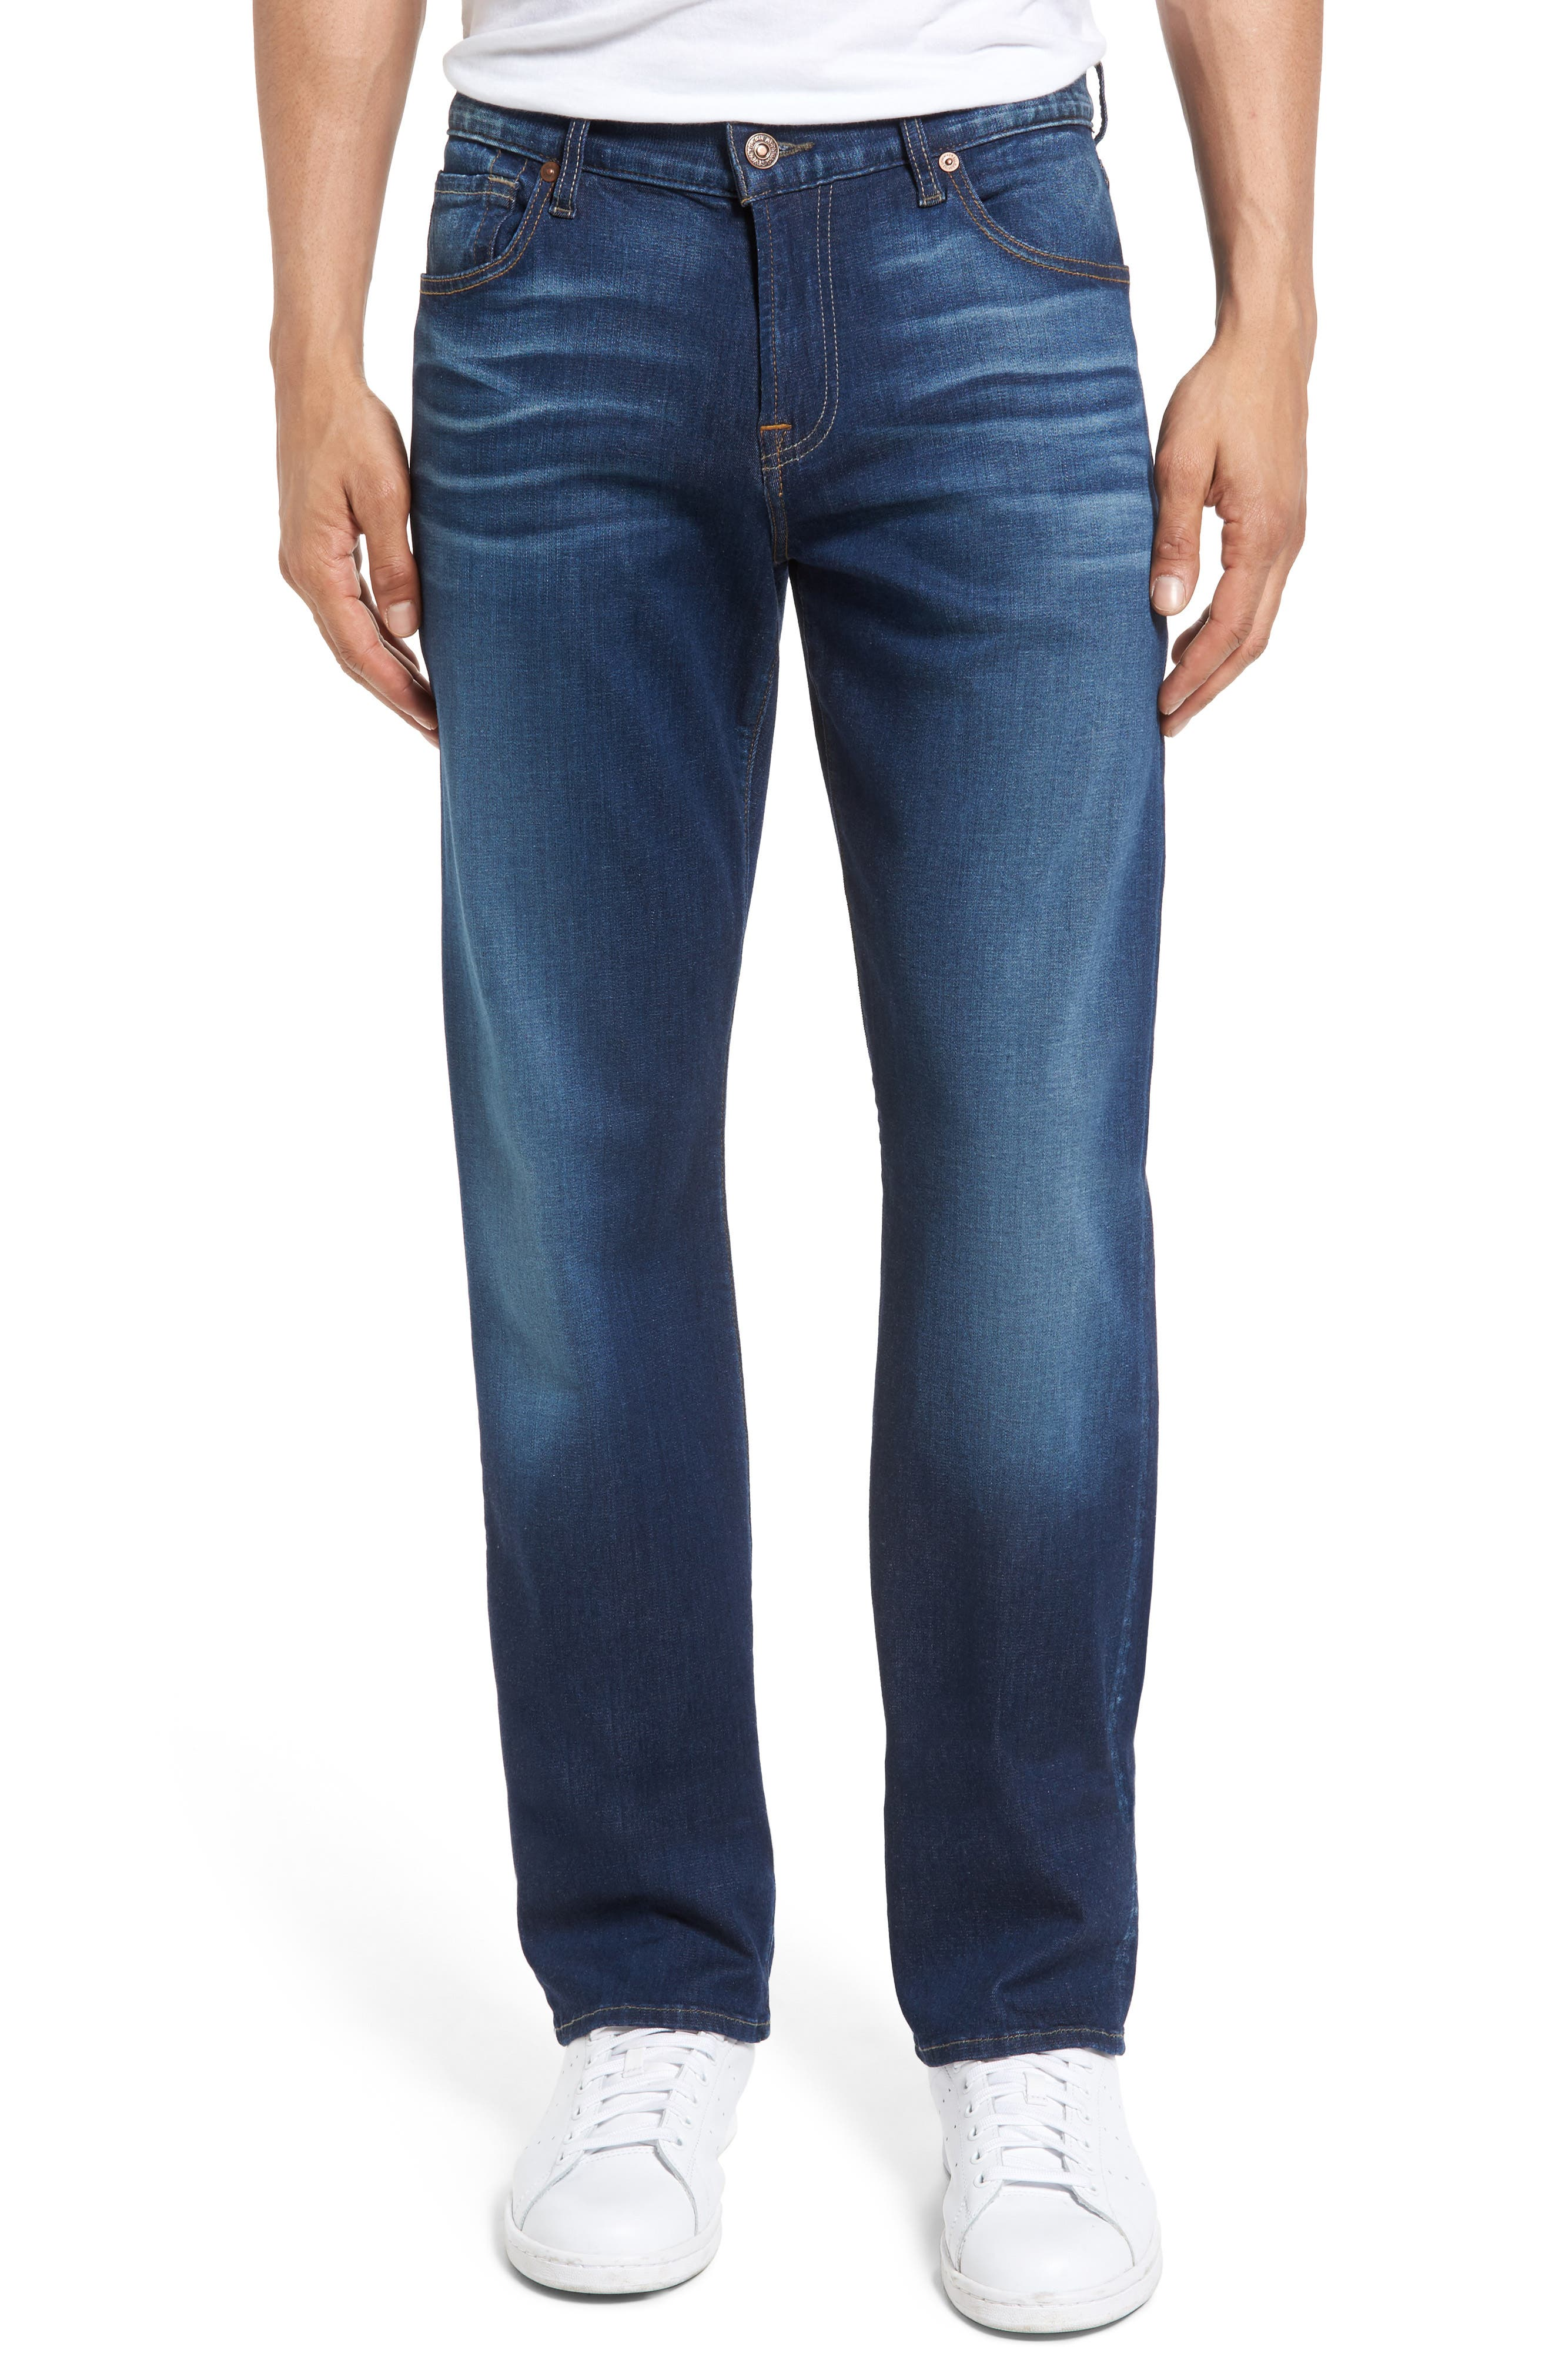 Slimmy Slim Fit Jeans,                         Main,                         color, Momt- Momentum